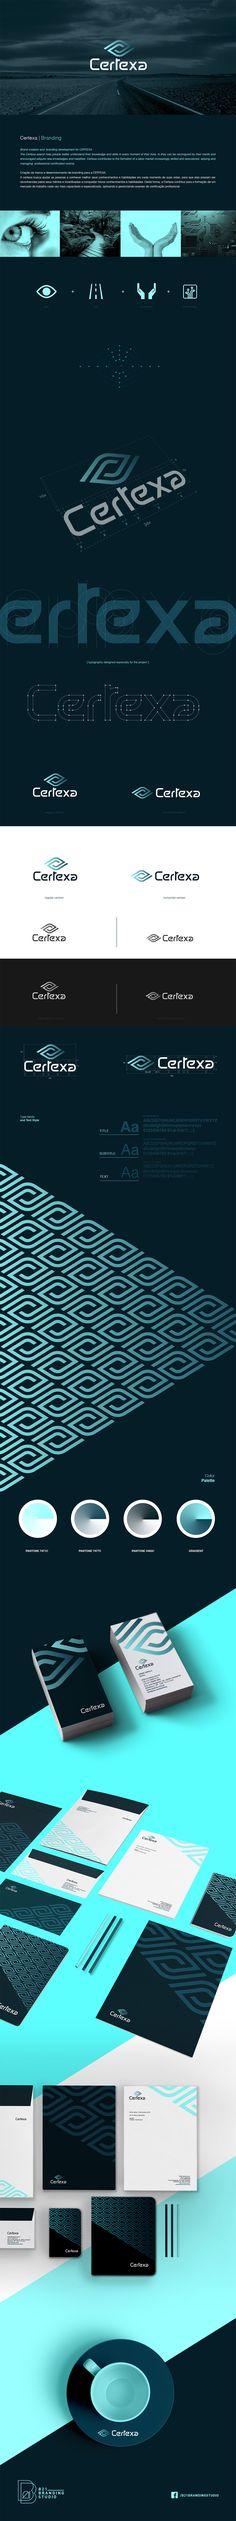 Branding and Visual Identity for Certexa | B21 Branding Studio